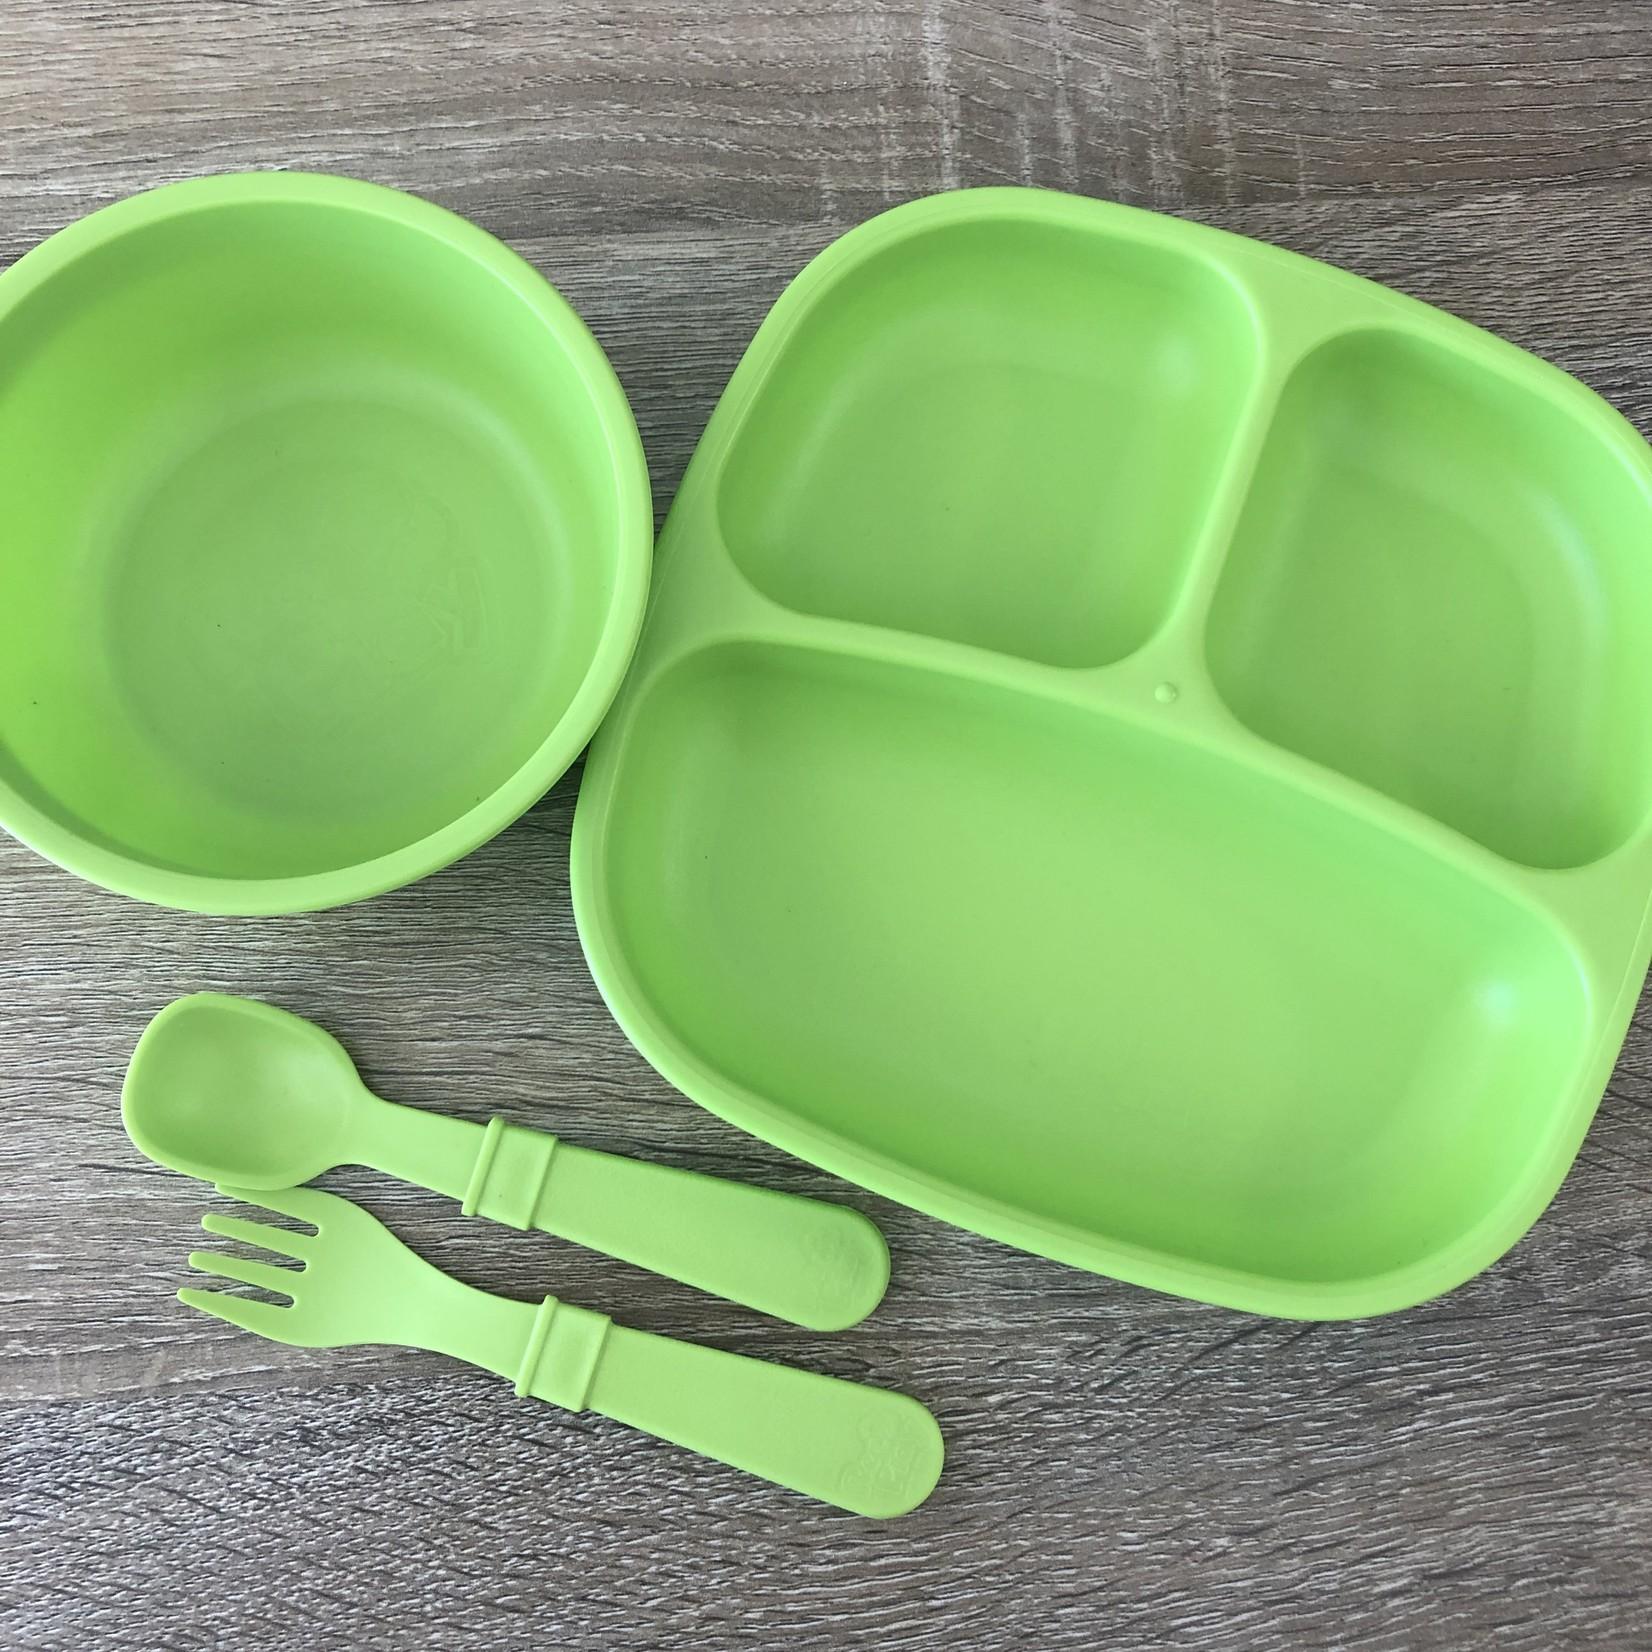 Replay Replay Dinner Set - Green